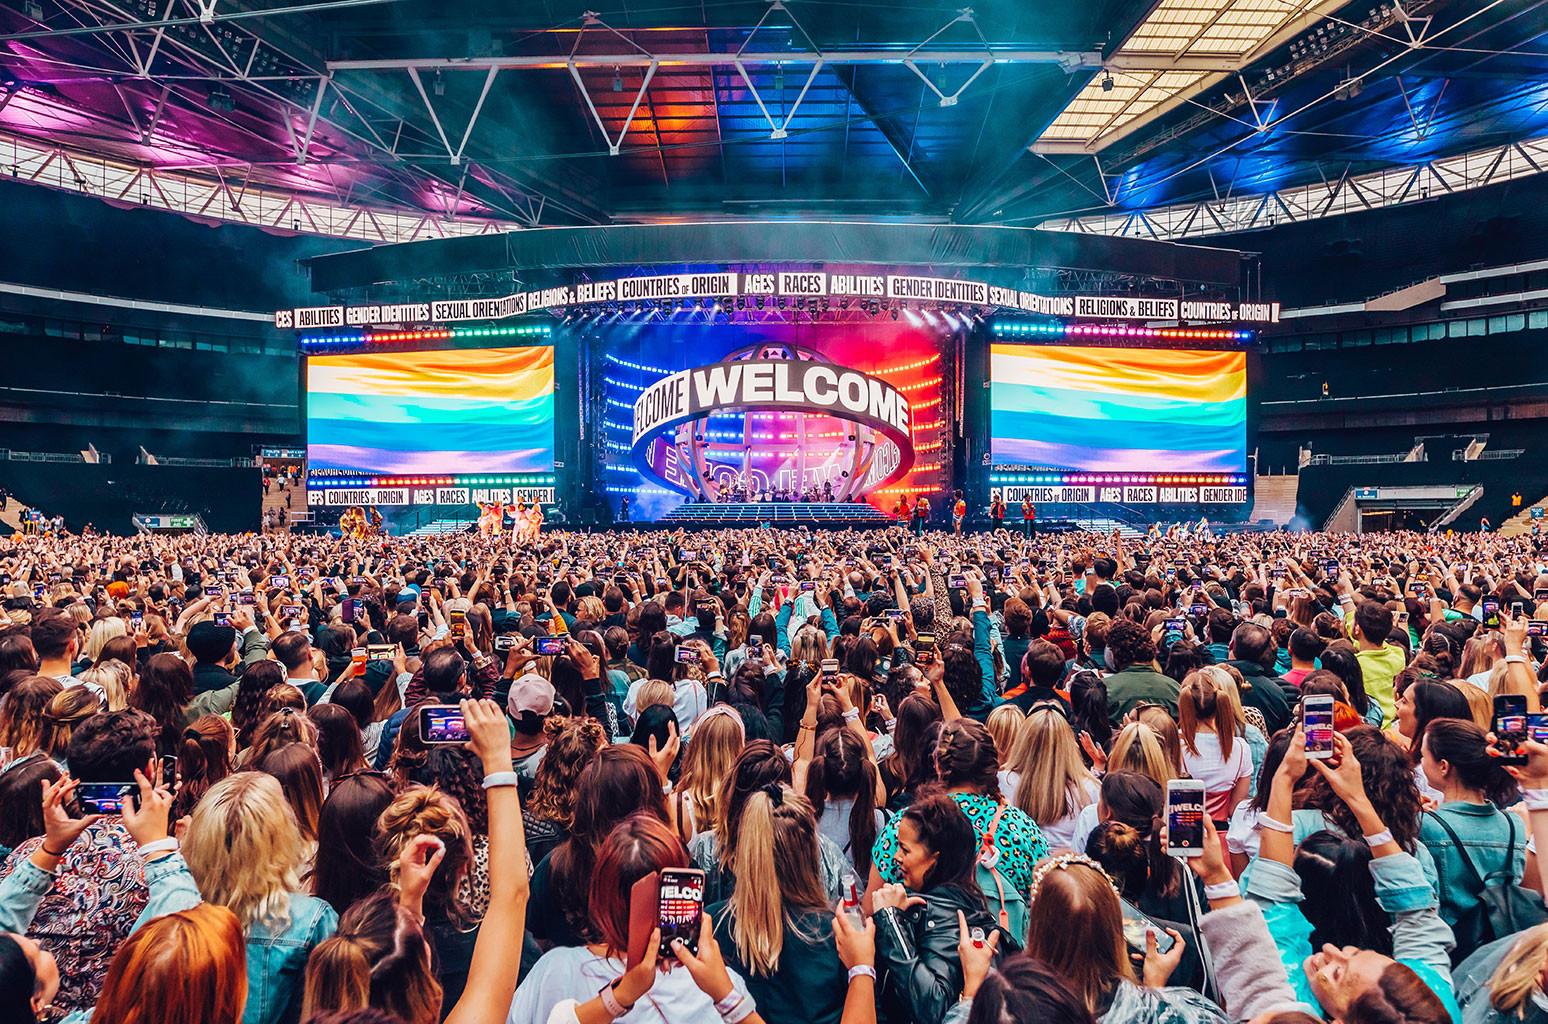 Spice World 2019 Tour London